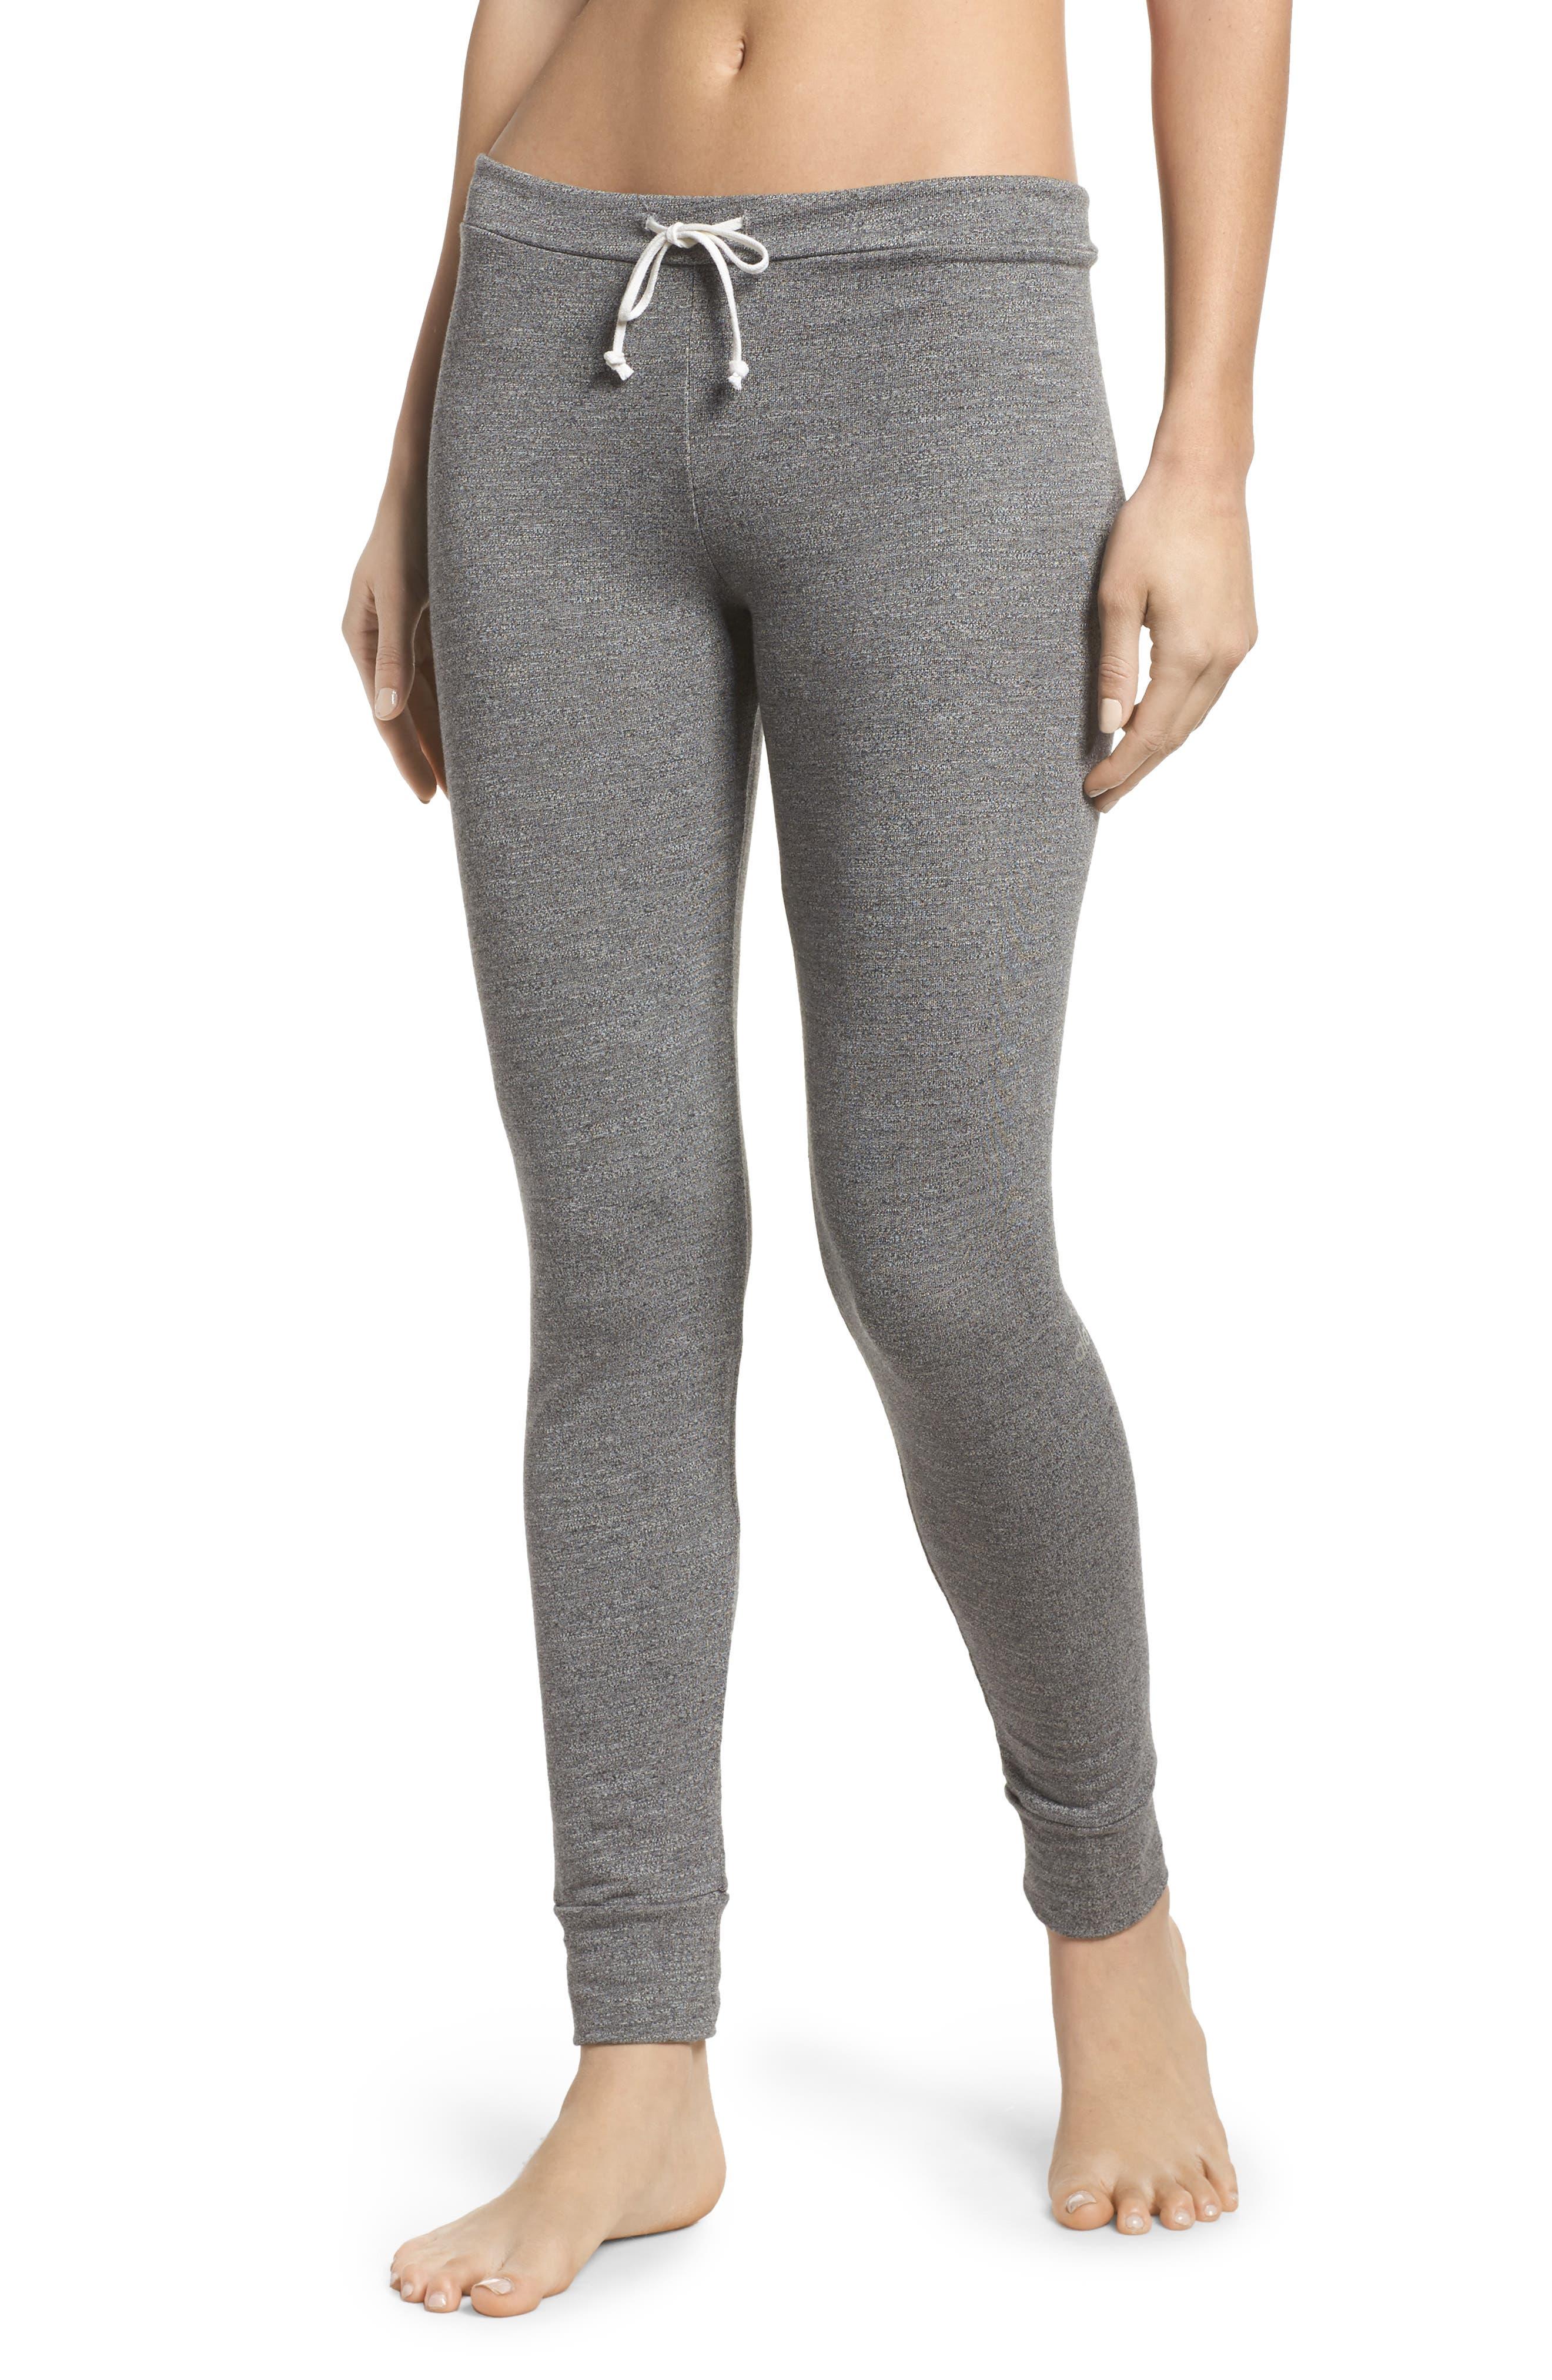 Twiggy Sweatpants,                         Main,                         color, Dove Grey Heather